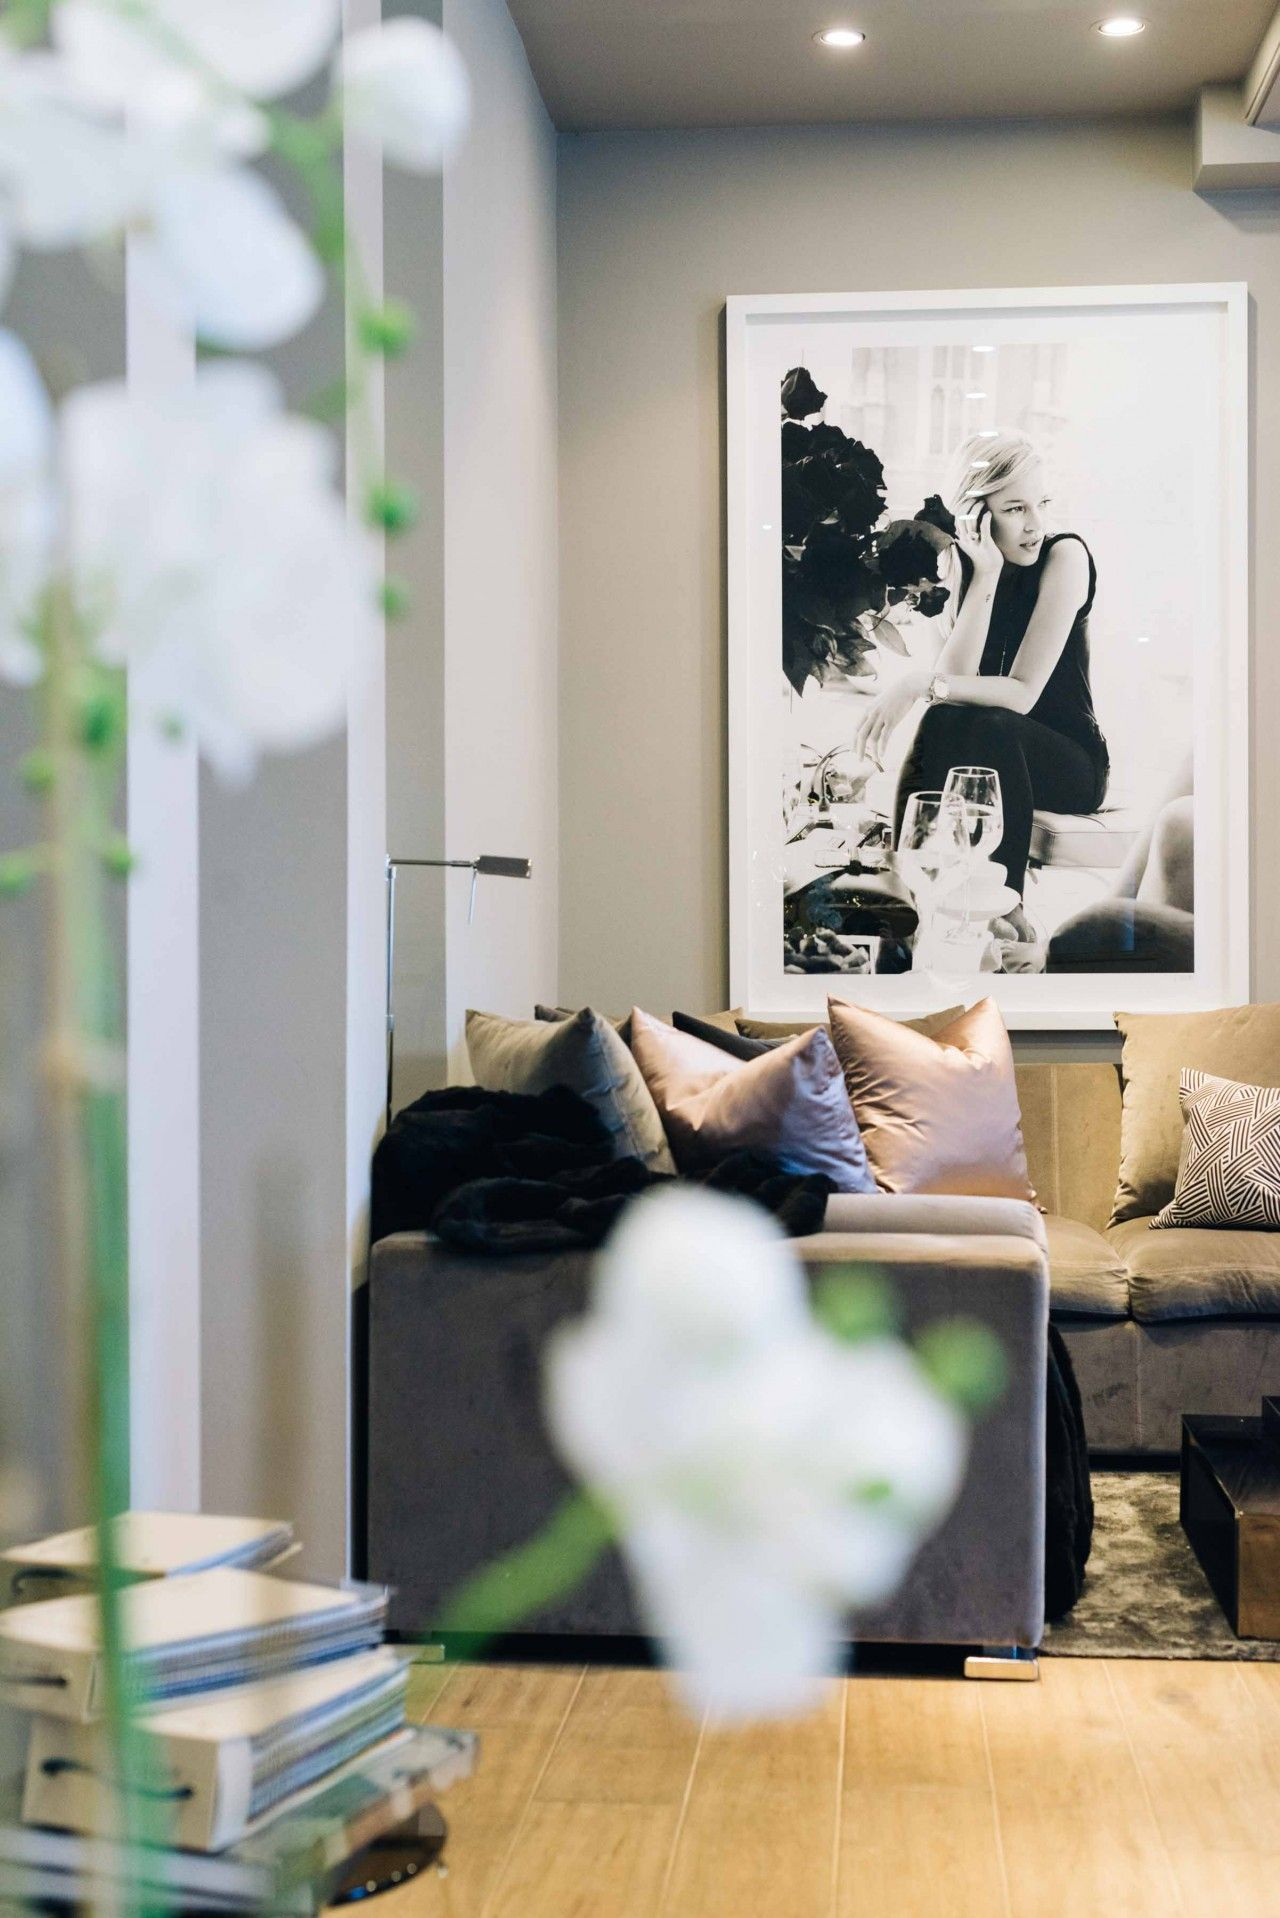 The United Kingdom / London / @Pimlico Road / Show Room / Avalon / Cobra Art / The Interior's House / Michael Reeves Associates / Eric Kuster / Metropolitan Luxury